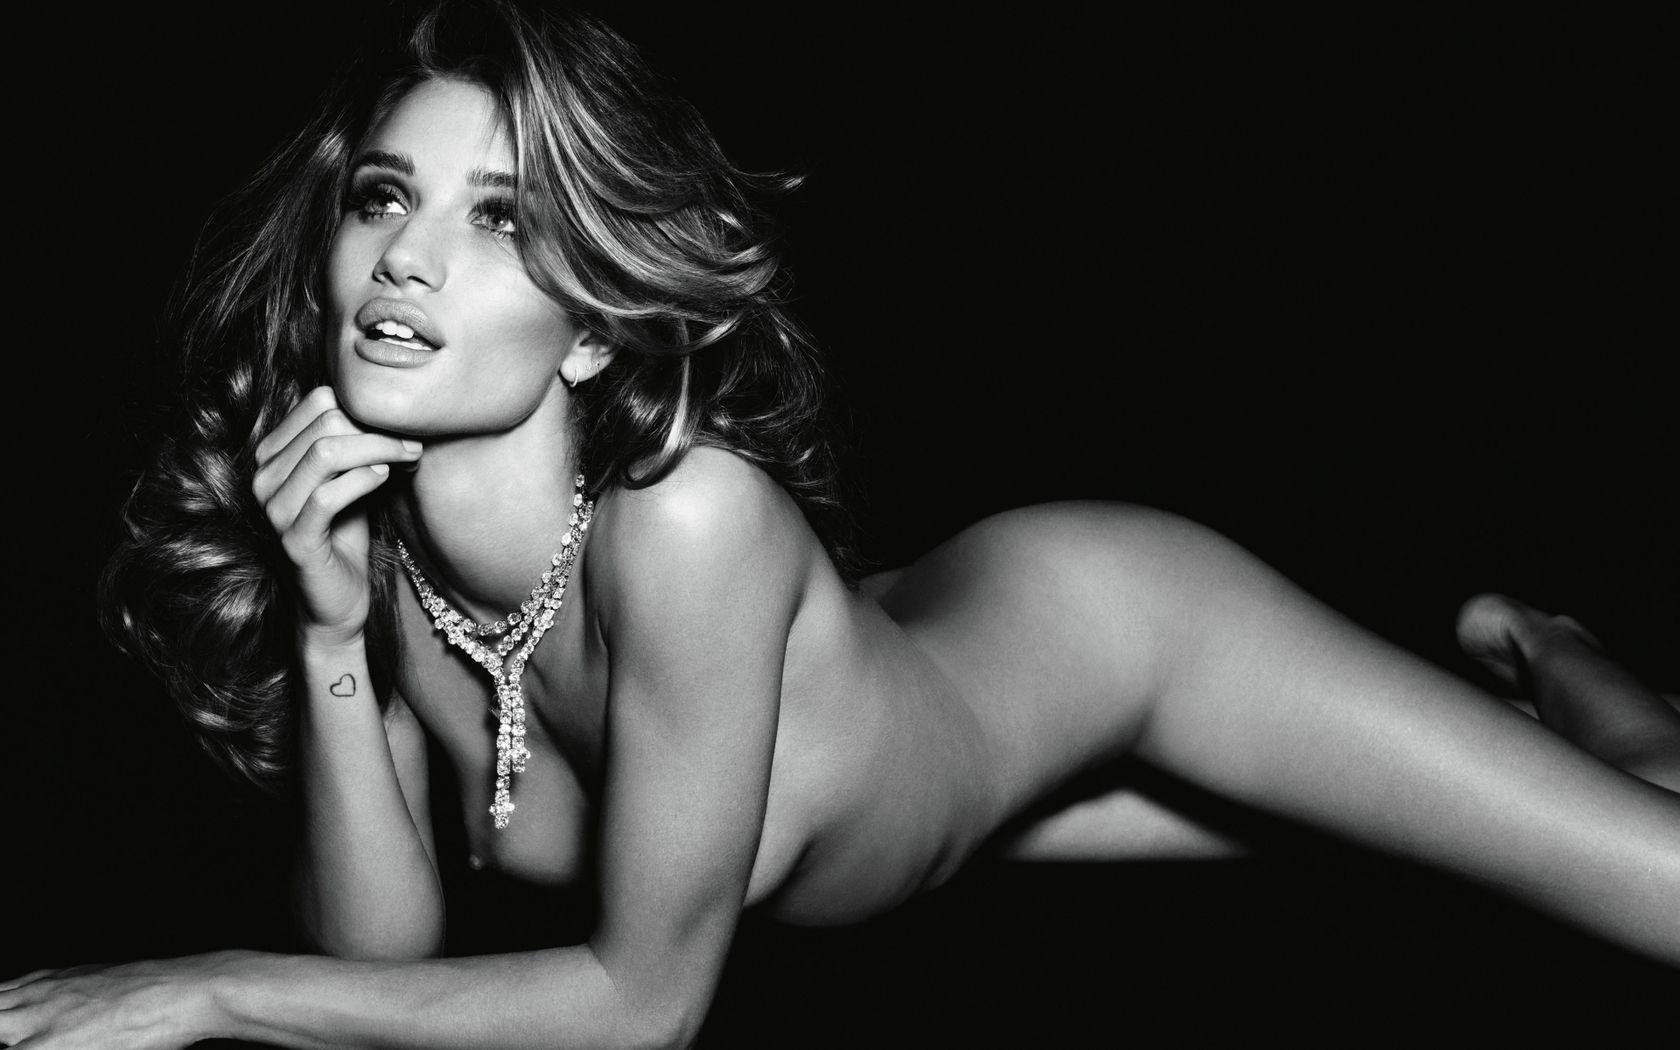 Model Victoria's Secret Paling Cantik dan Seksi